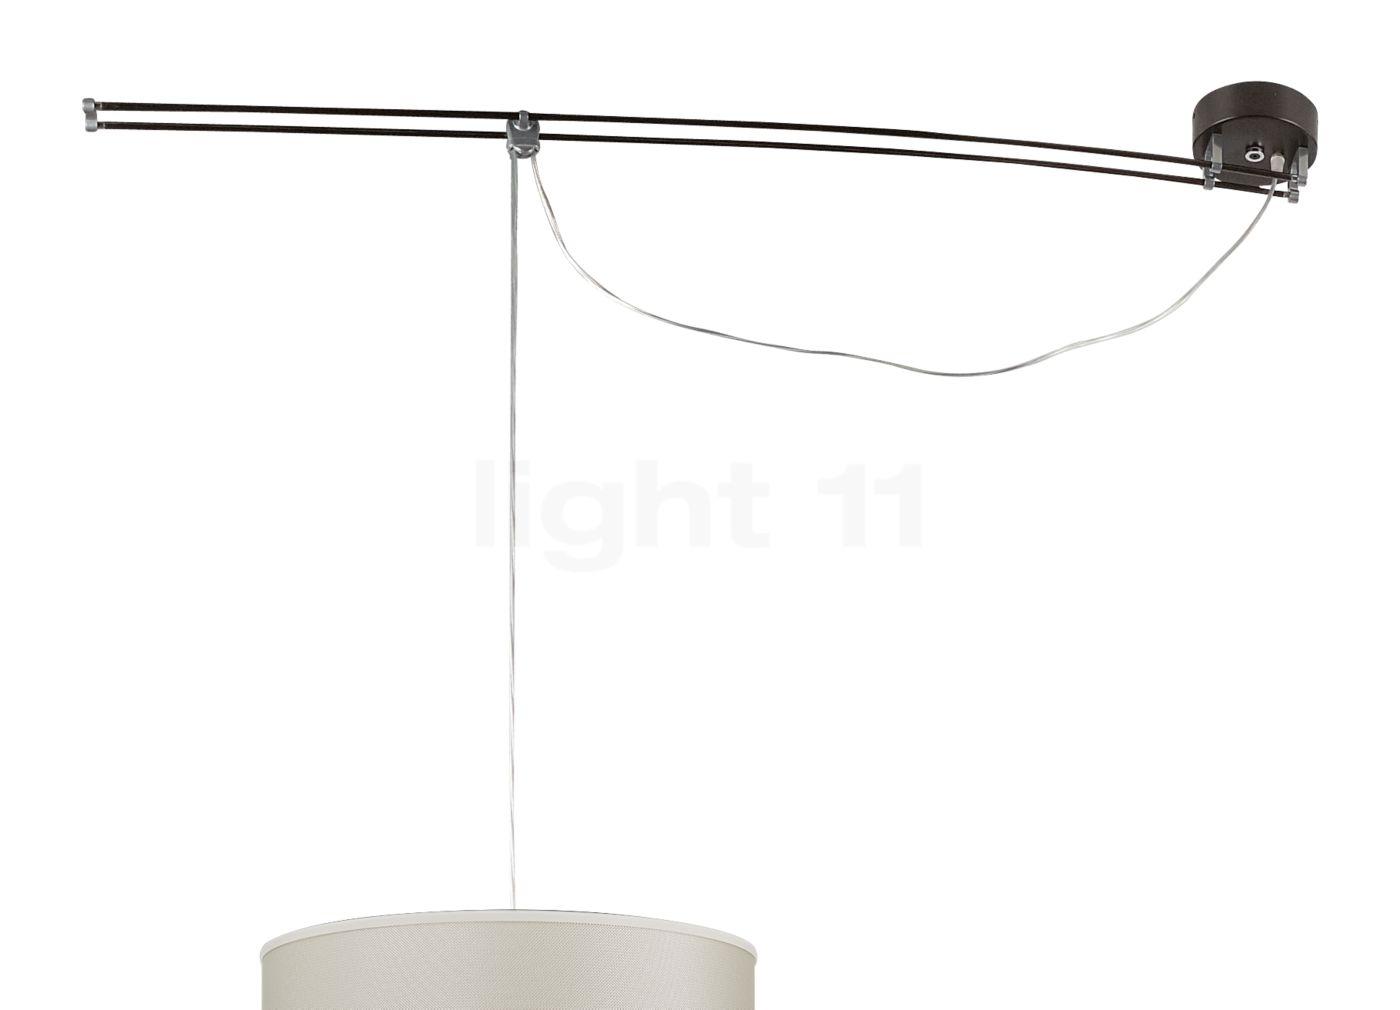 Lumina Moove 42 Mit Dezentralisierungskit Light11 De